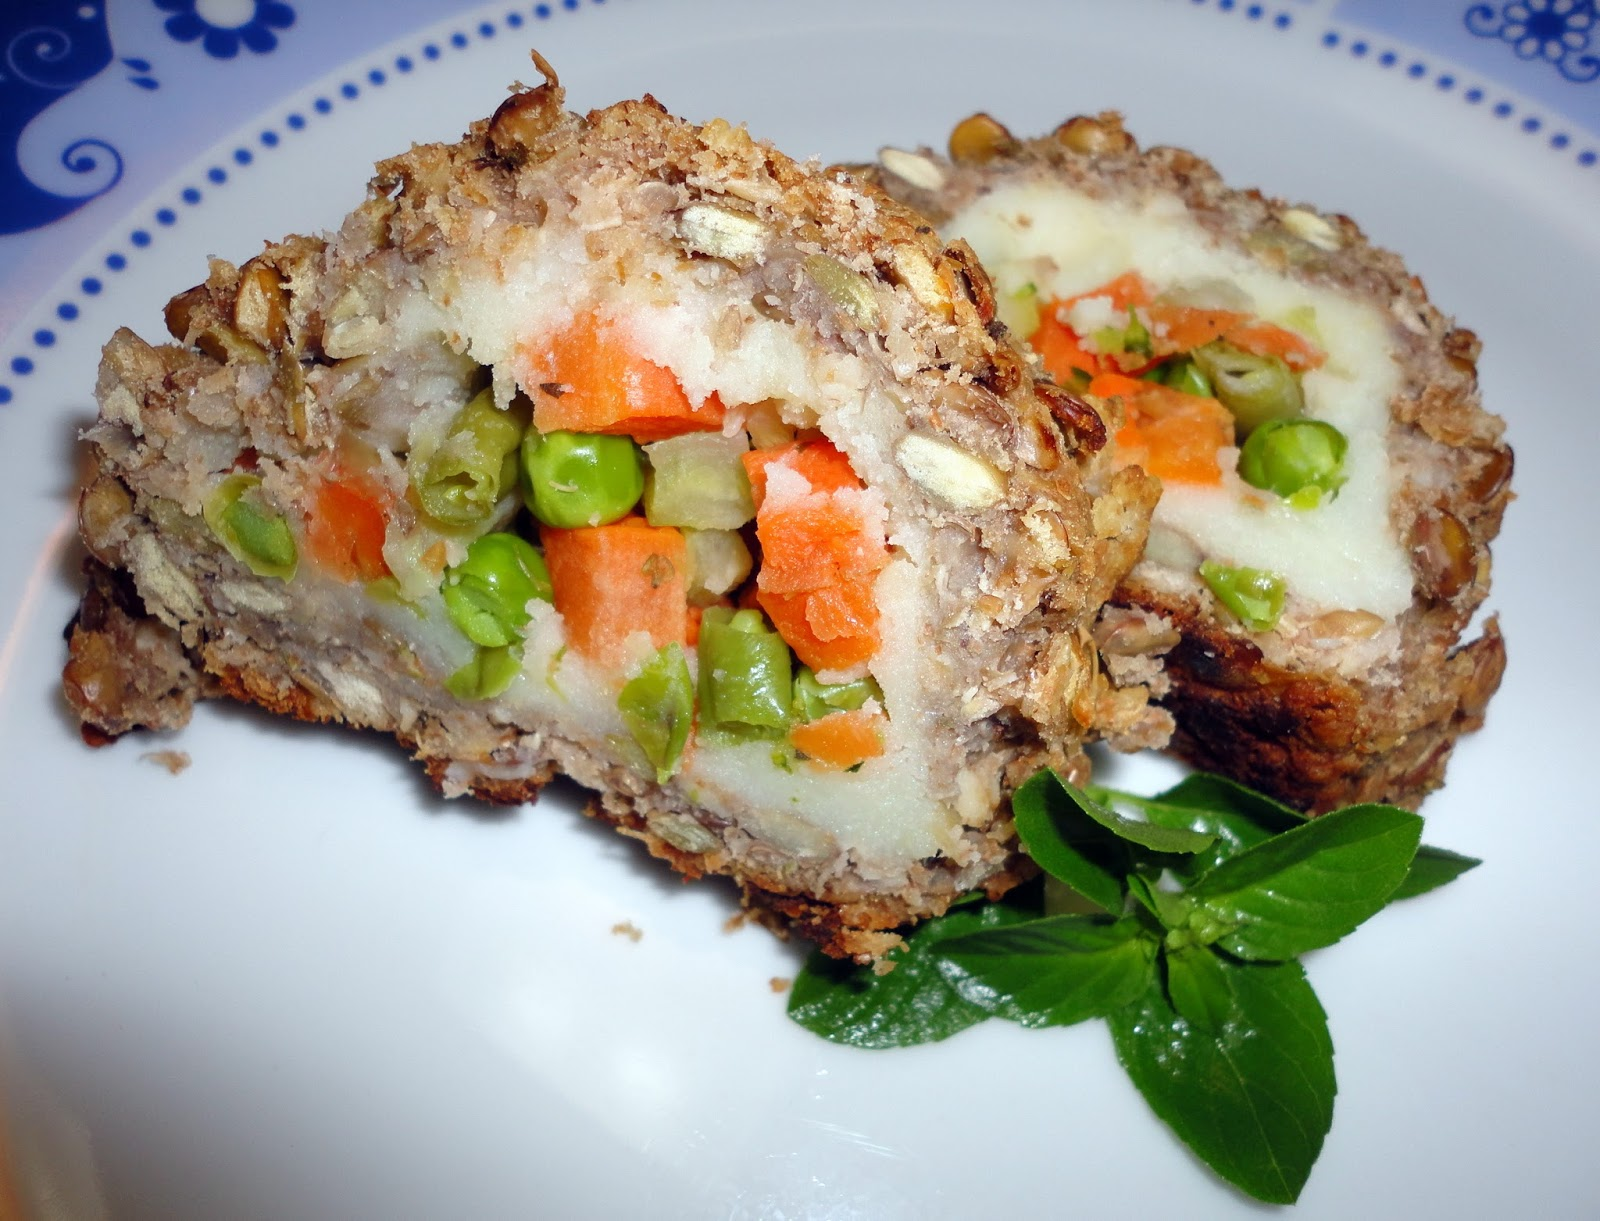 prato branco com duas fatias de rocambole salgado